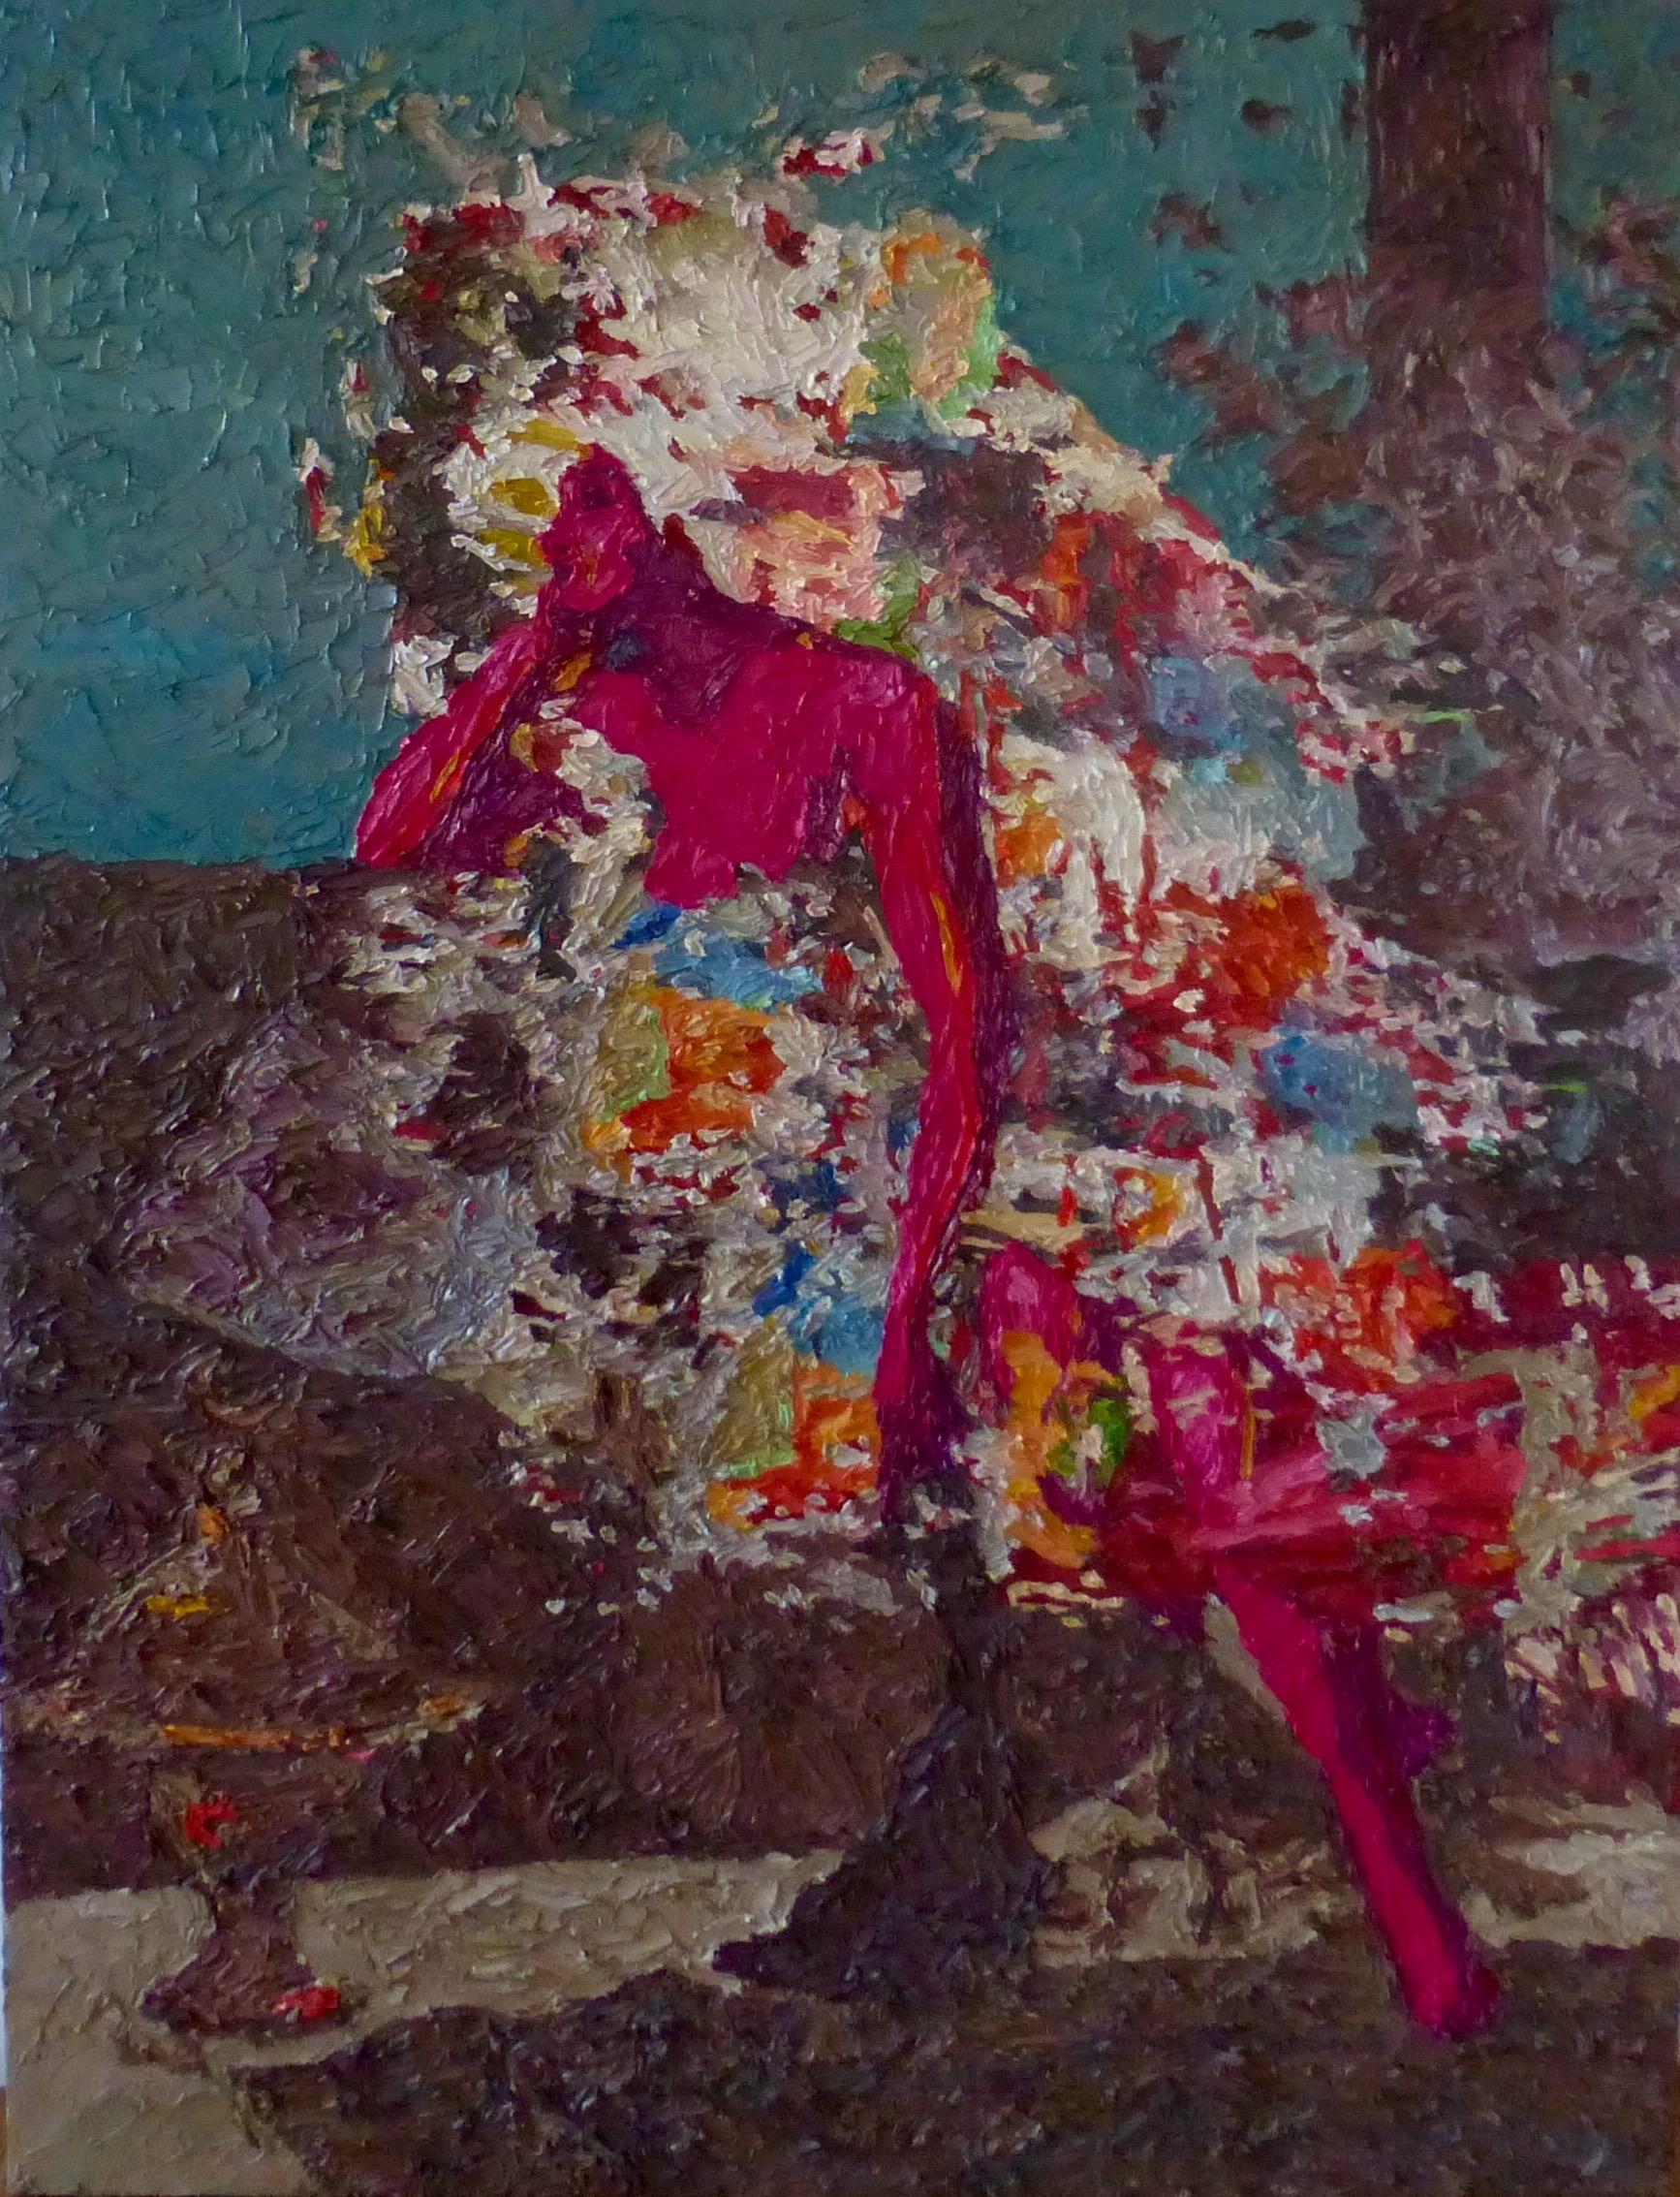 """Women's innermost subconscious desires"" by Hossam Dirar"